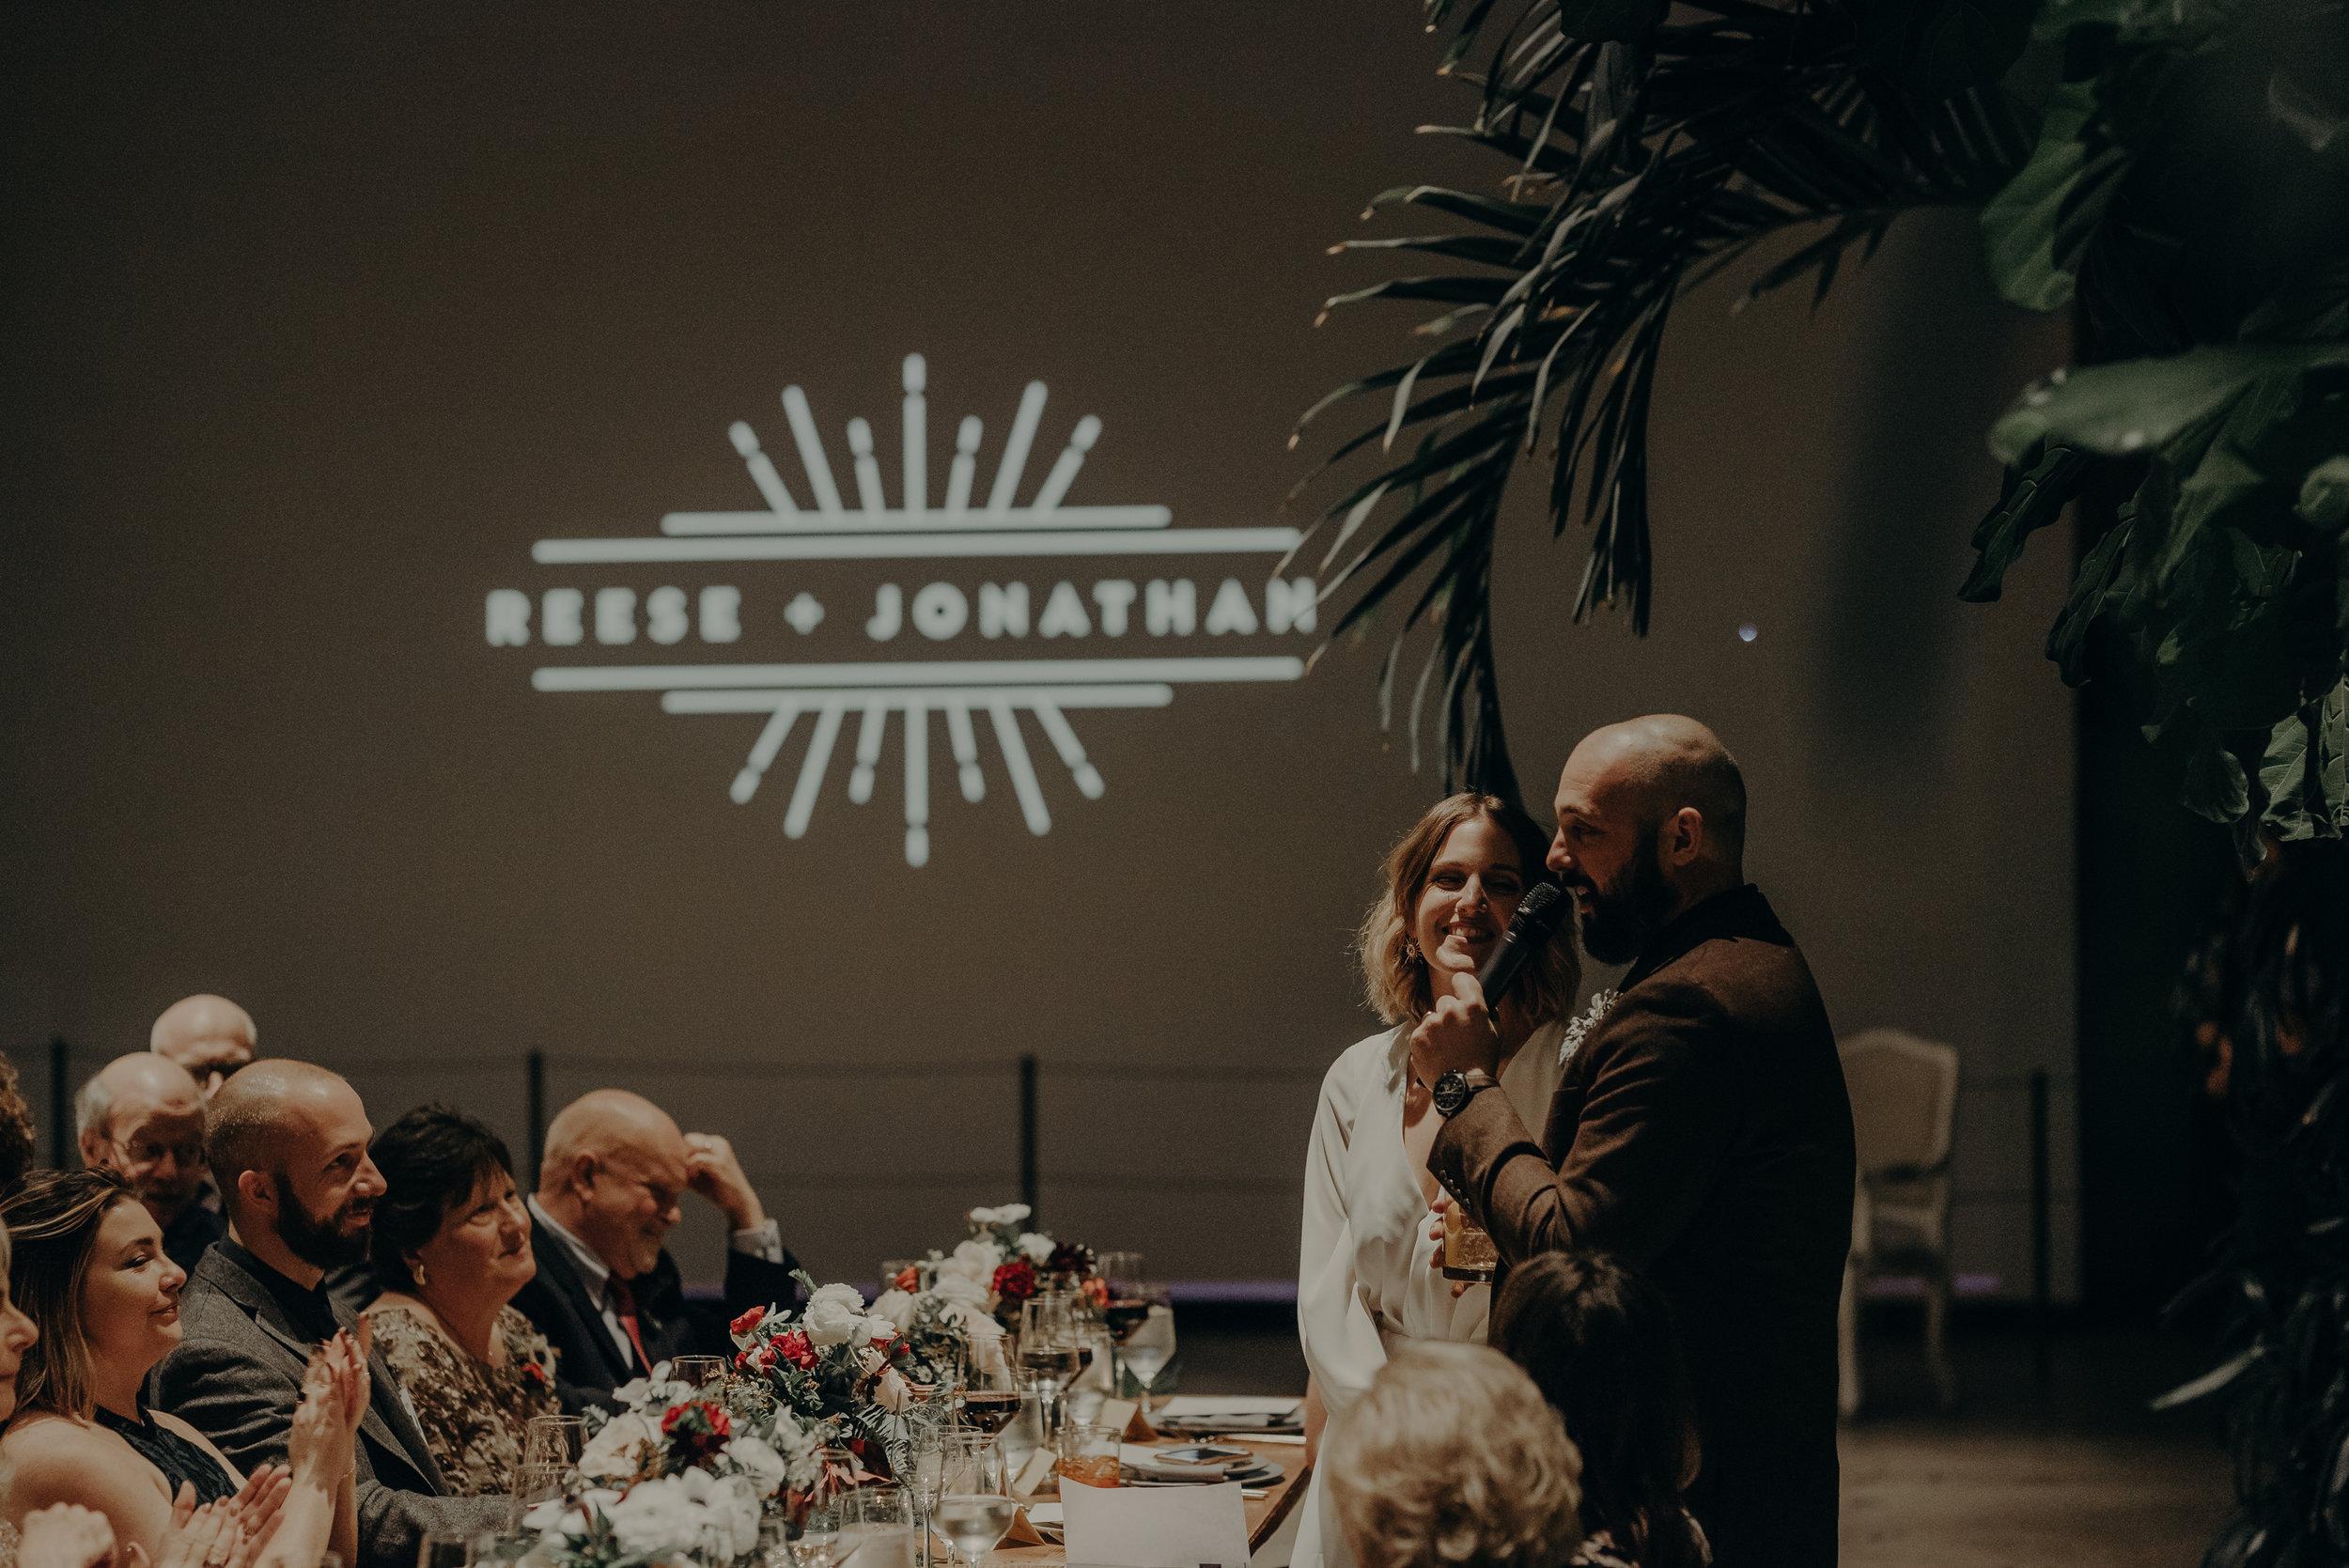 Isaiah + Taylor Photography - Reese + Jonathan Wedding-601.jpg